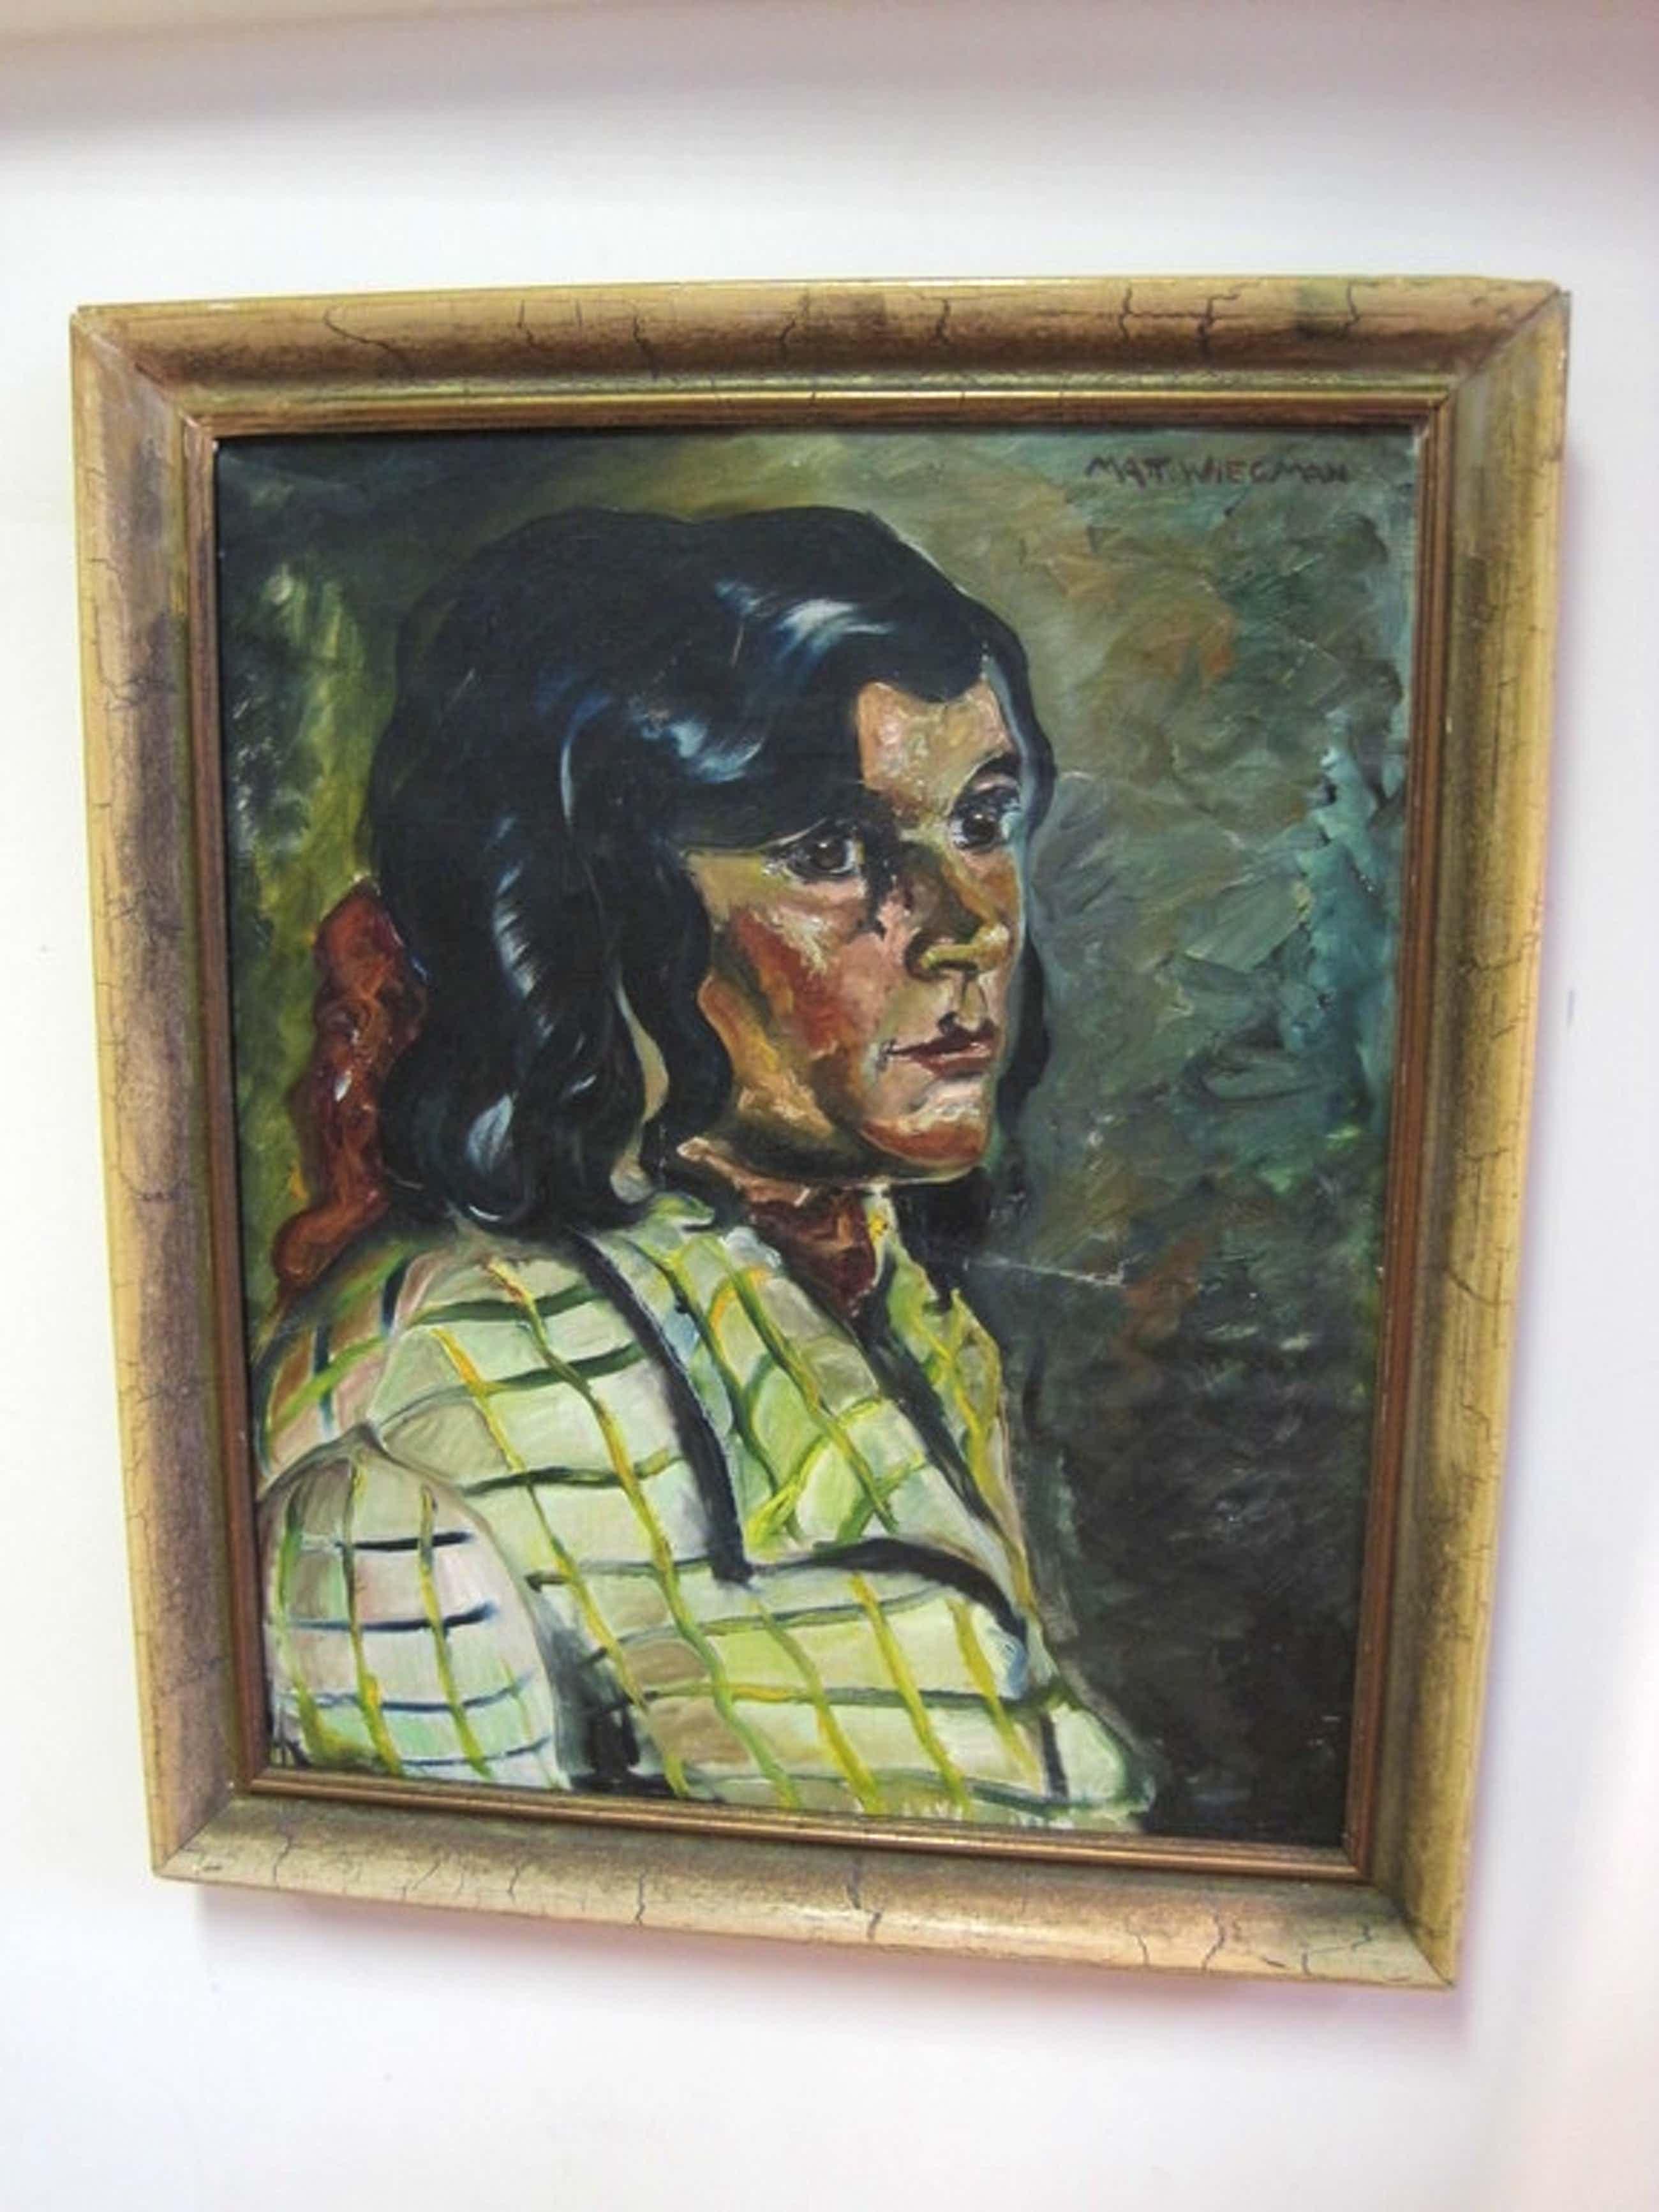 Matthieu Wiegman 1886-1971 Bergense School portret olieverf 1930 kopen? Bied vanaf 270!